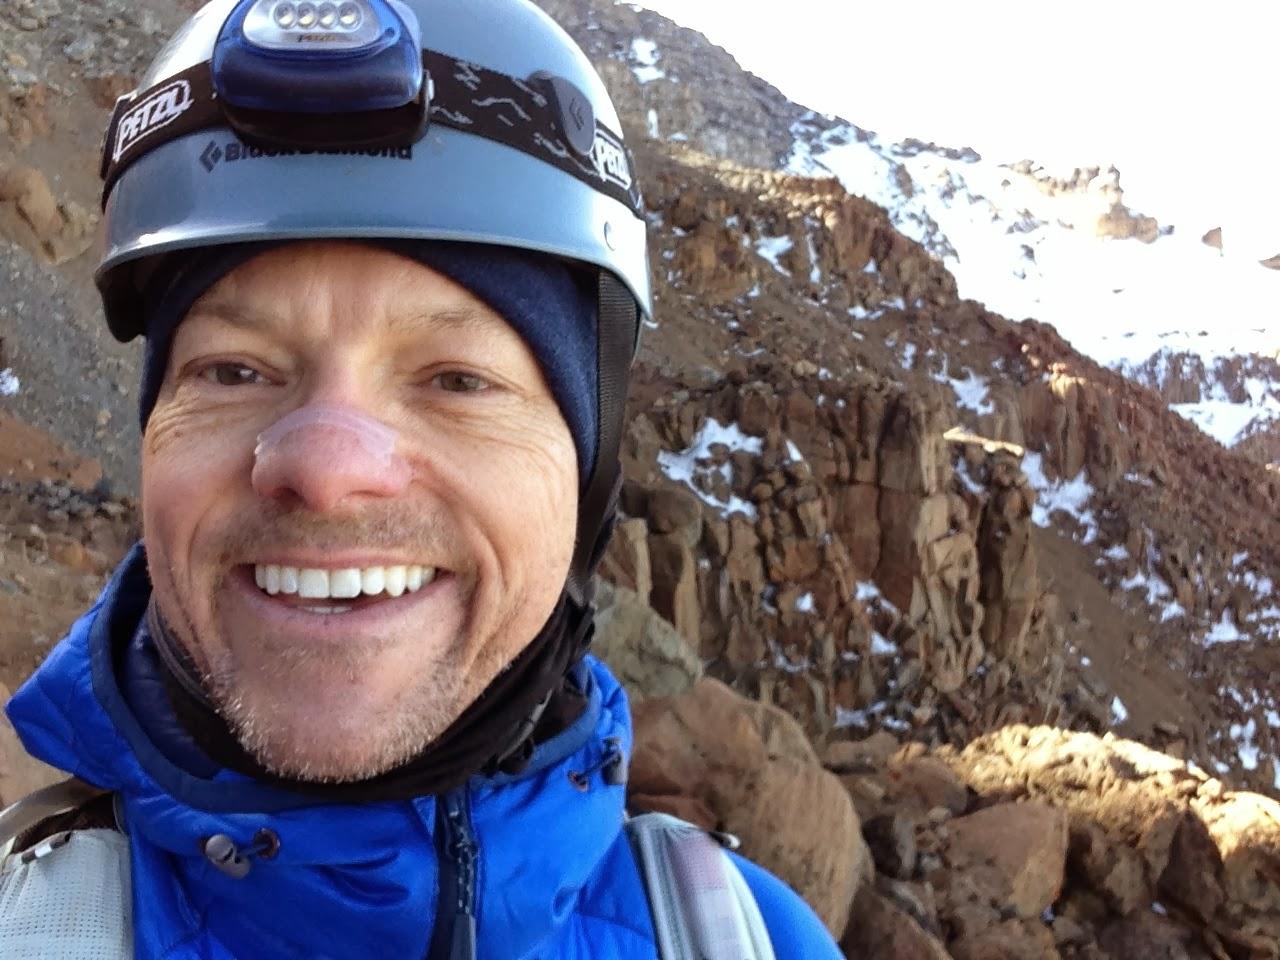 Tiger Beaudoin on the way to summiting Mt. Kilimanjaro